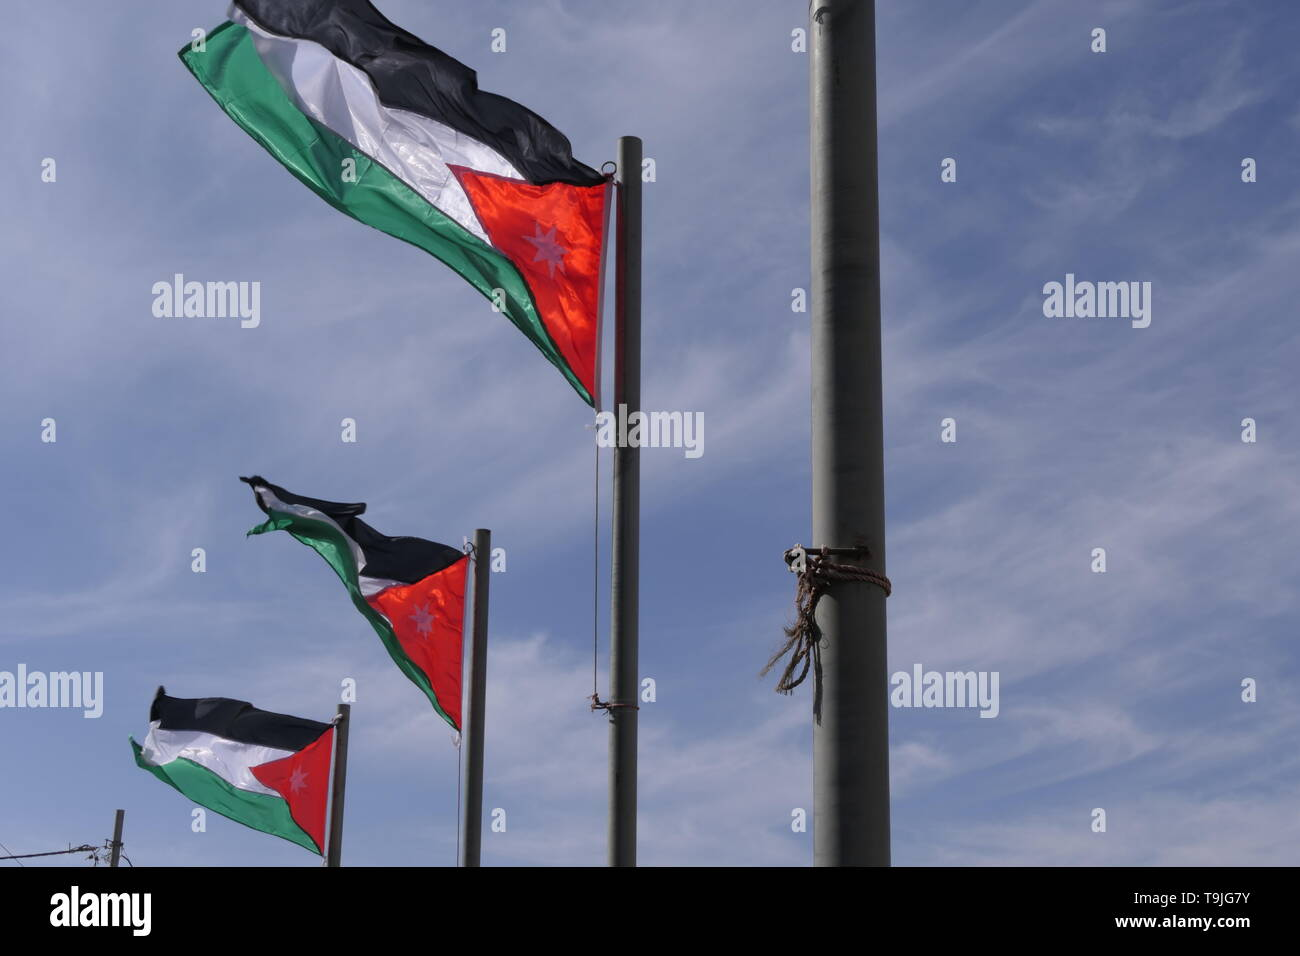 National flag of Jordan on a flagpole in the Hashemite Kingdom of Jordan - Stock Image